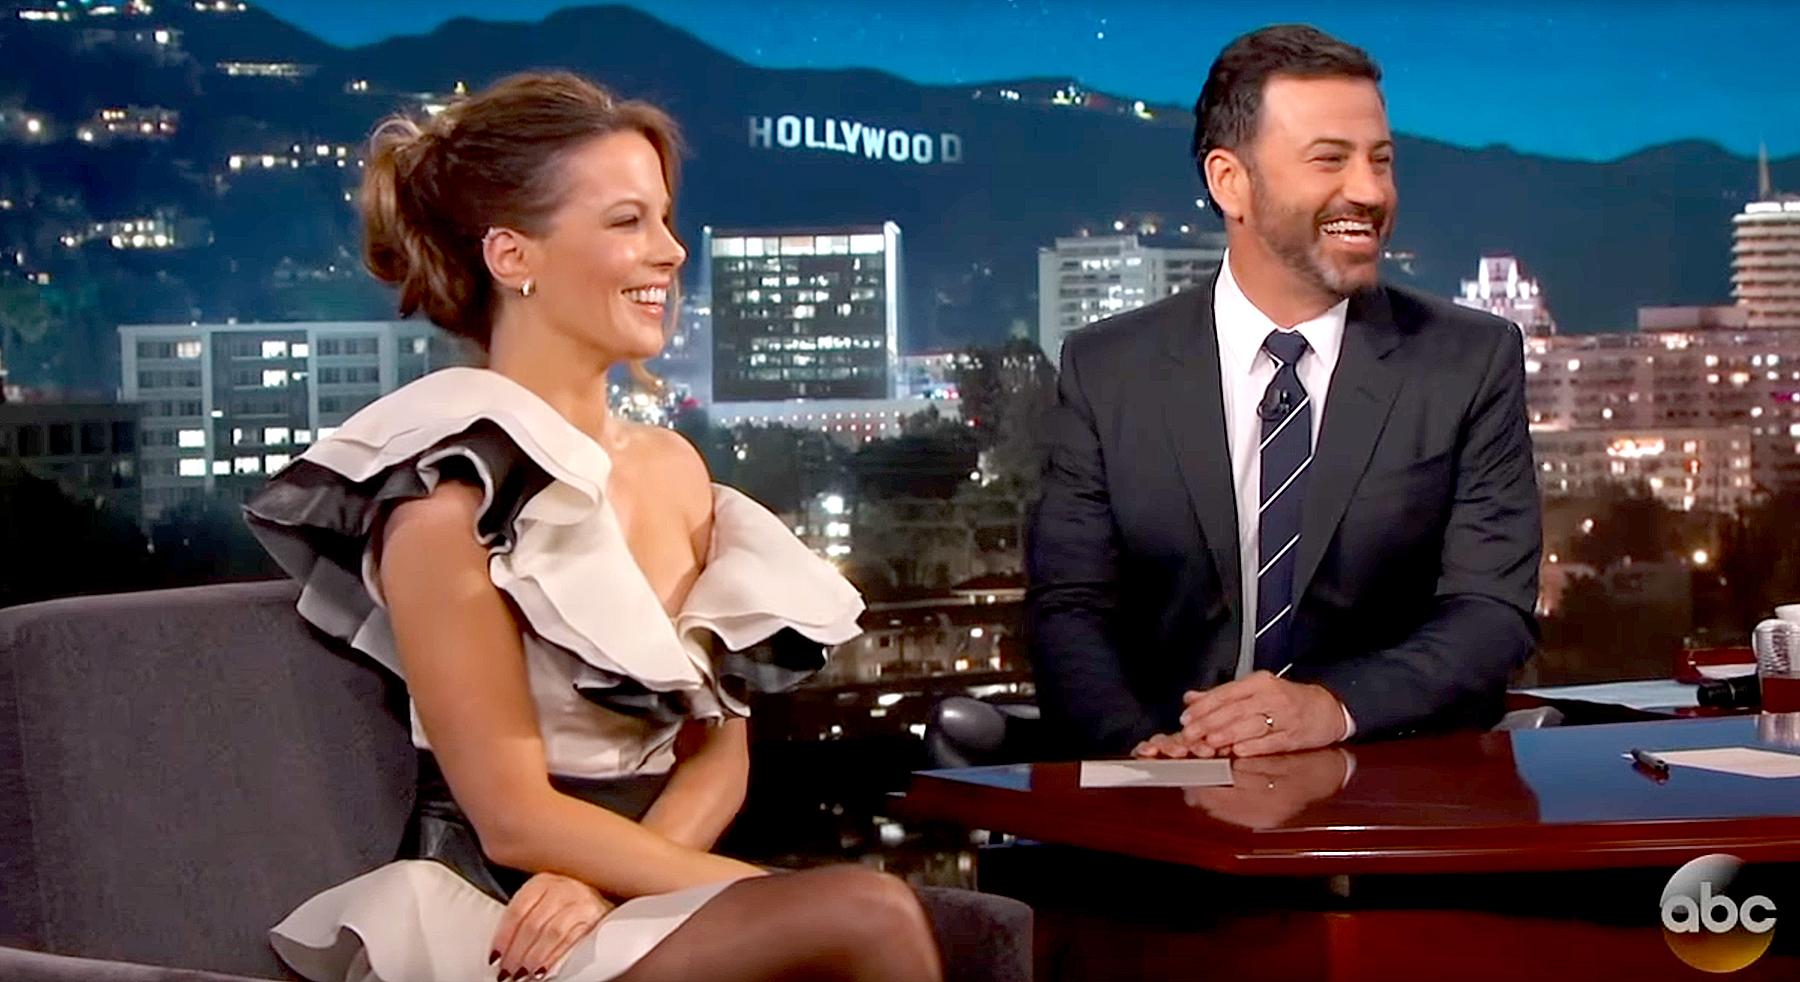 Kate Beckinsale and Jimmy Kimmel